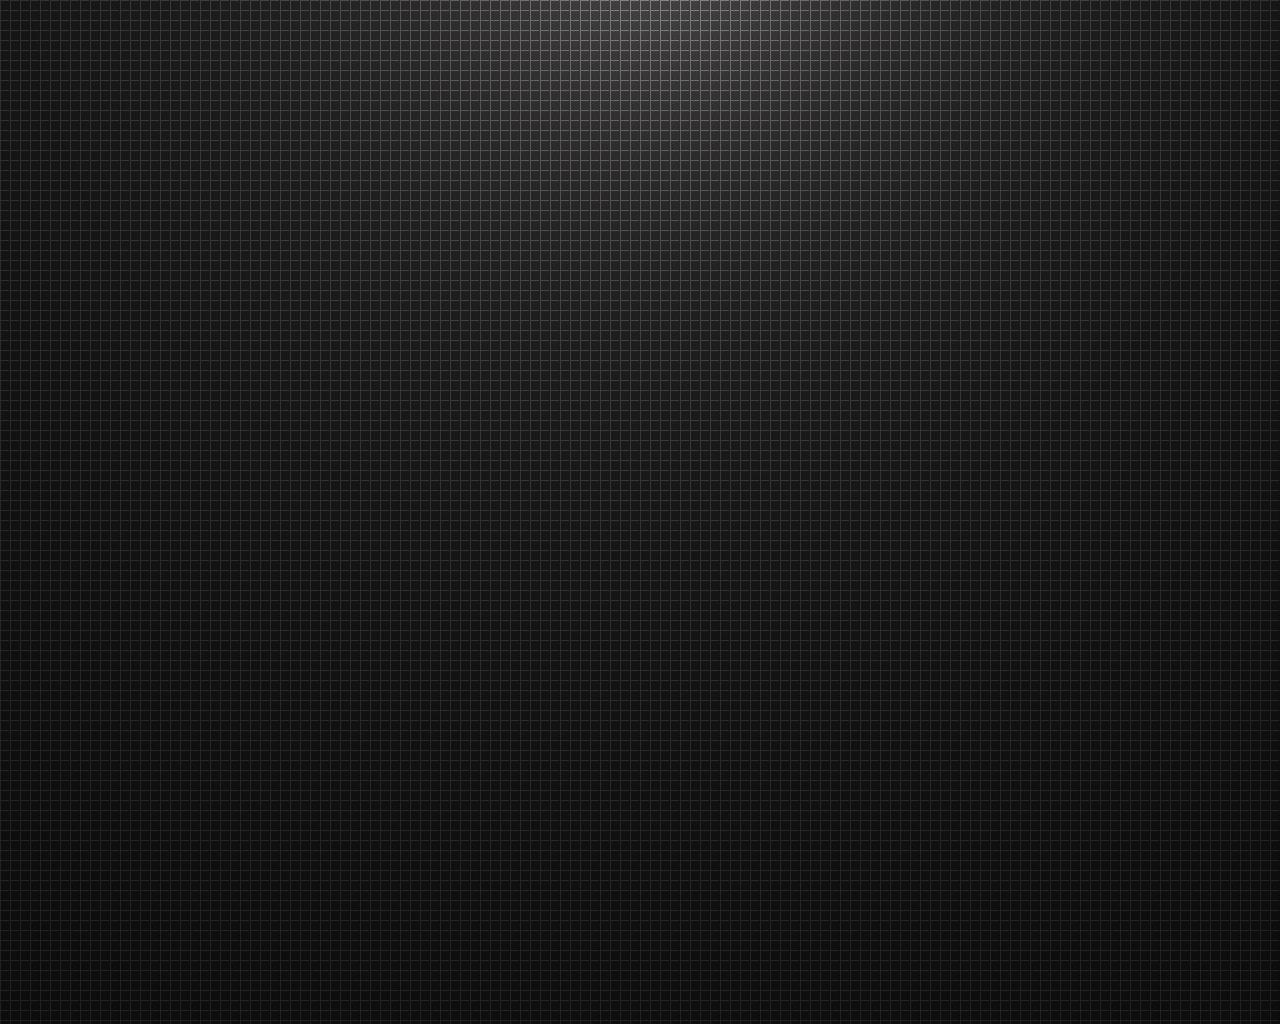 Dark Squares III by iAmFreeman